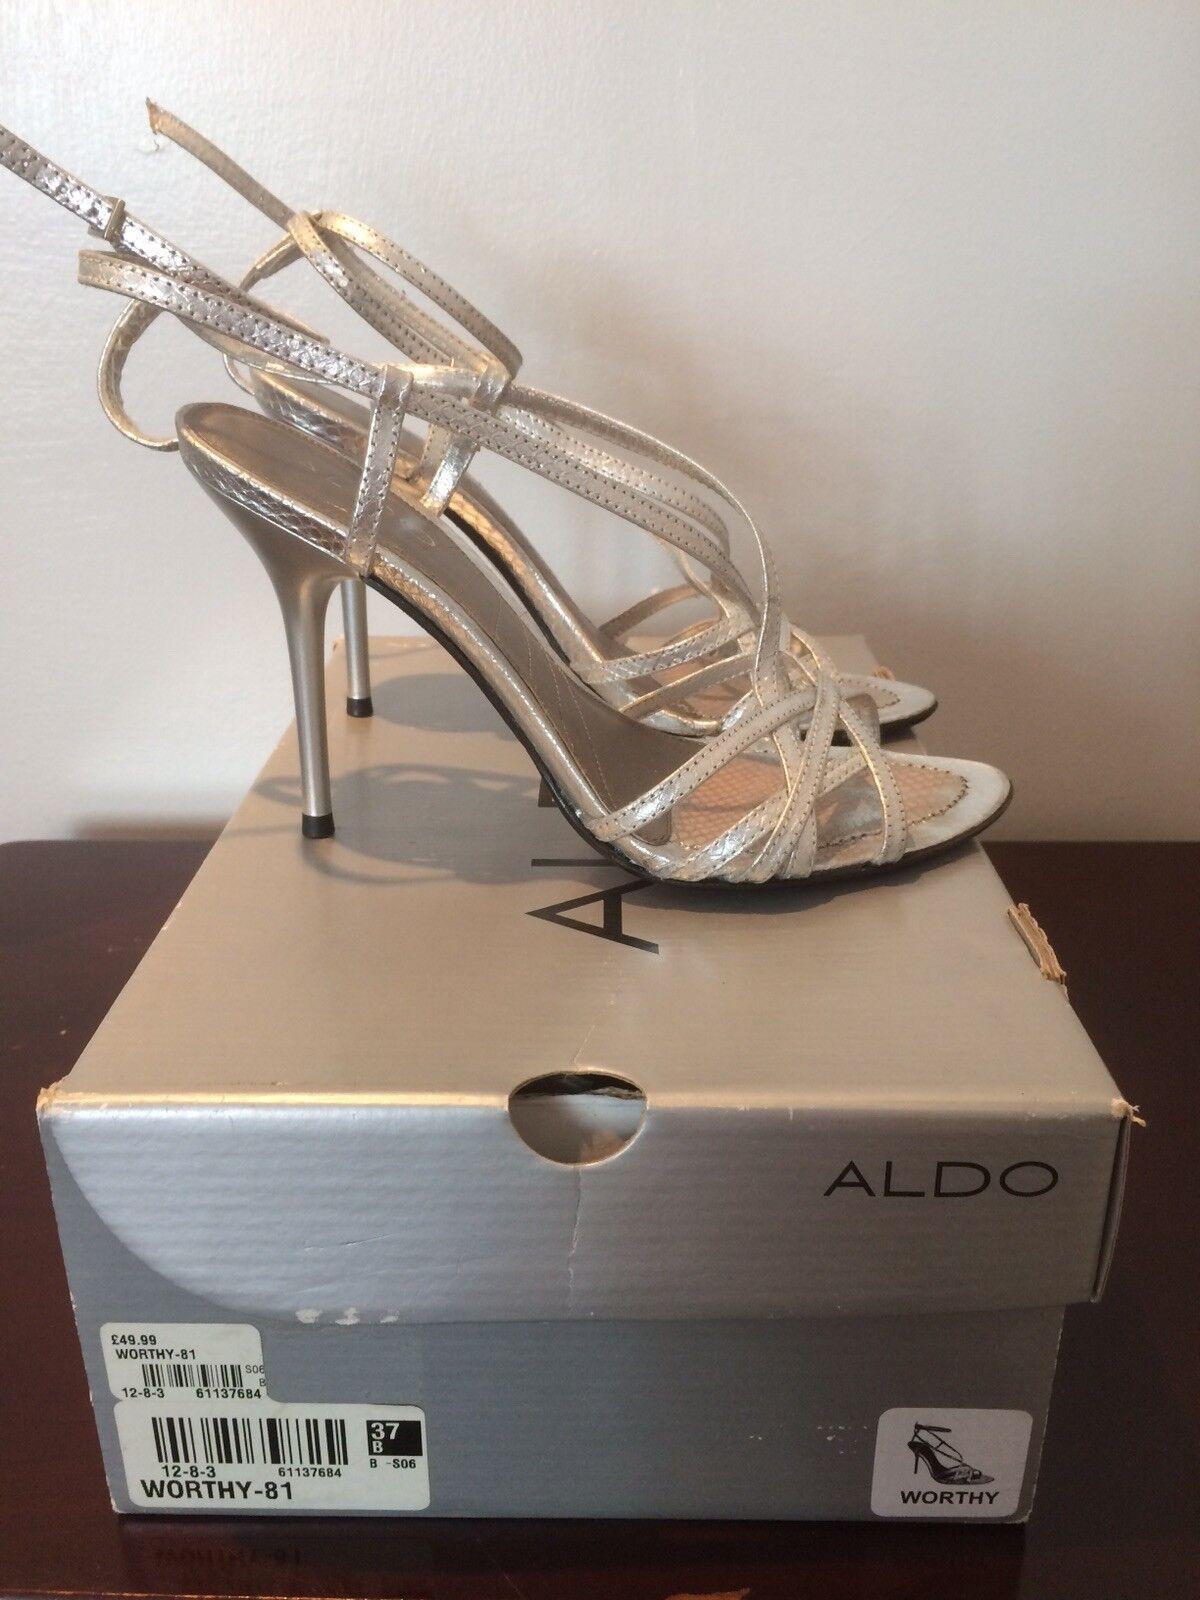 ALDO silver Stappy High Heeled Shoe UK size 4. worn Once RRP